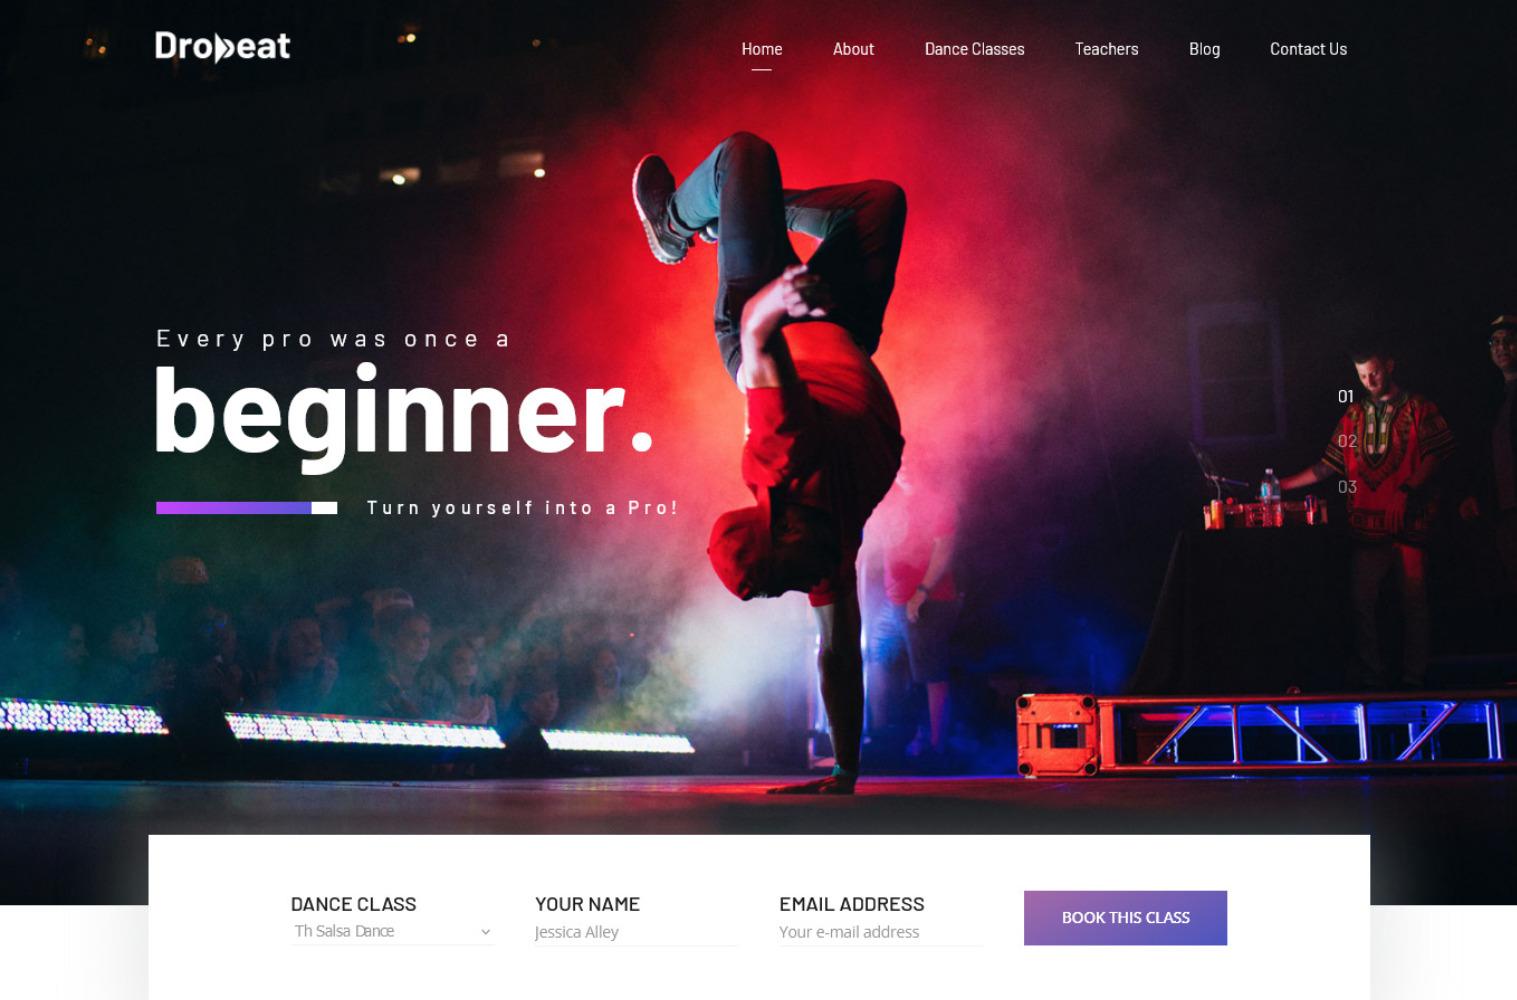 Dropbeat Alternative Dance Studio WordPress Themes